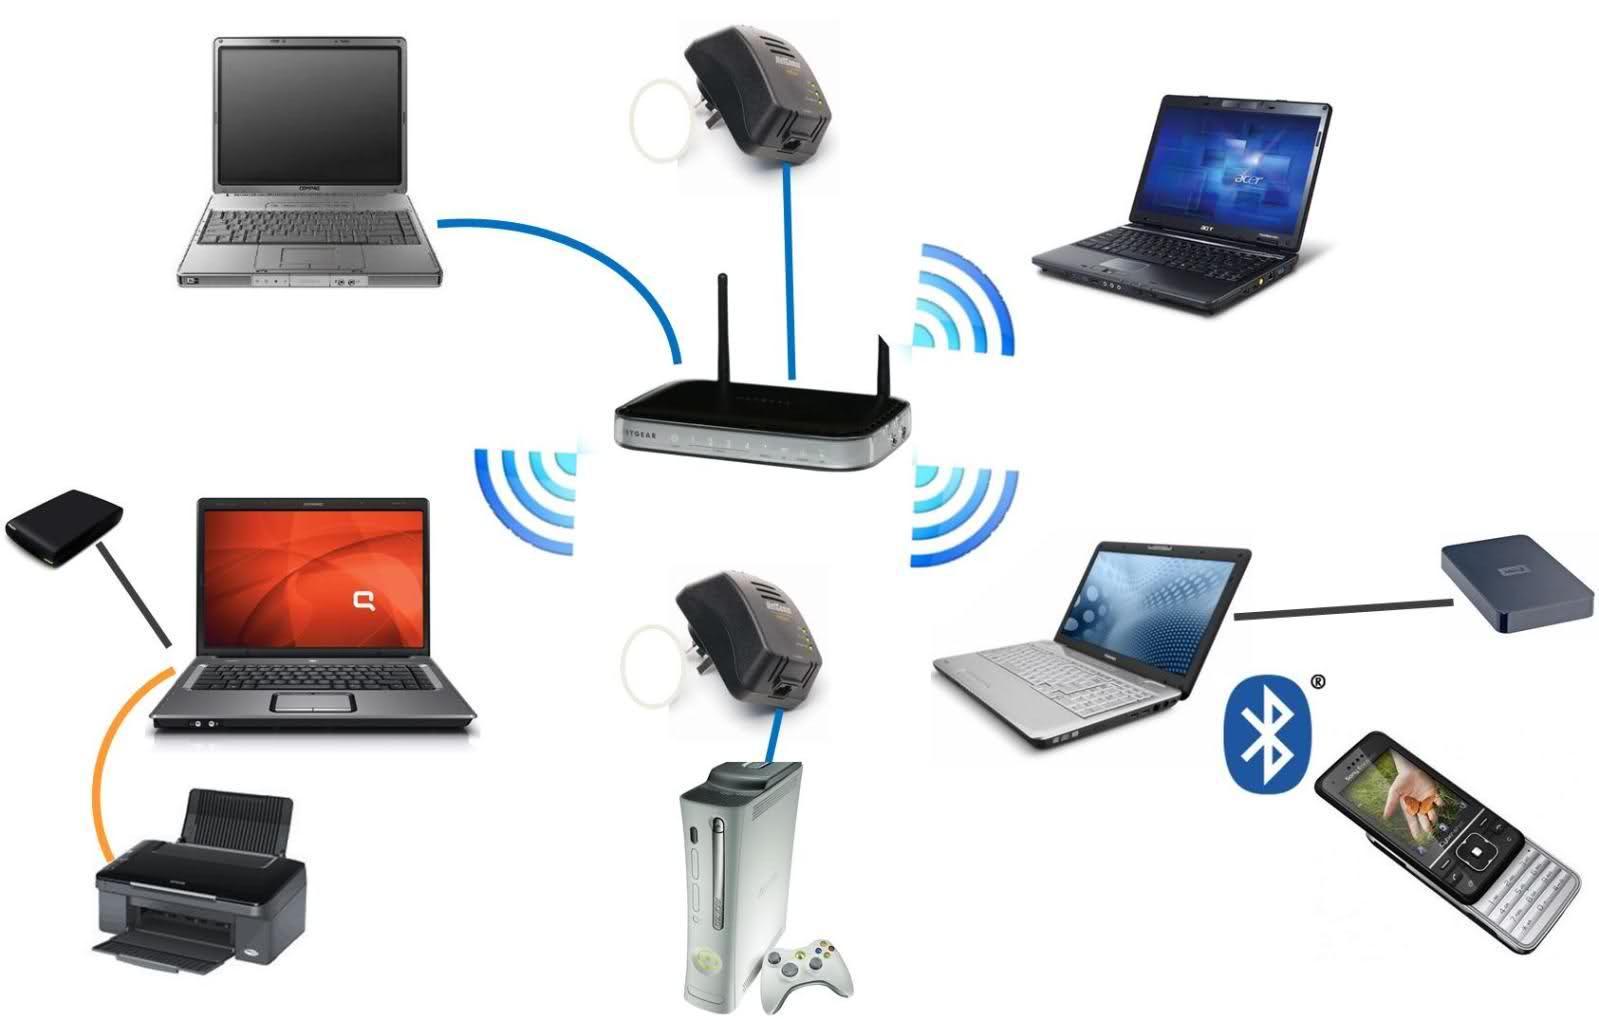 Computer Network & Internet Setup-Wi-Fi, Ethernet and Home